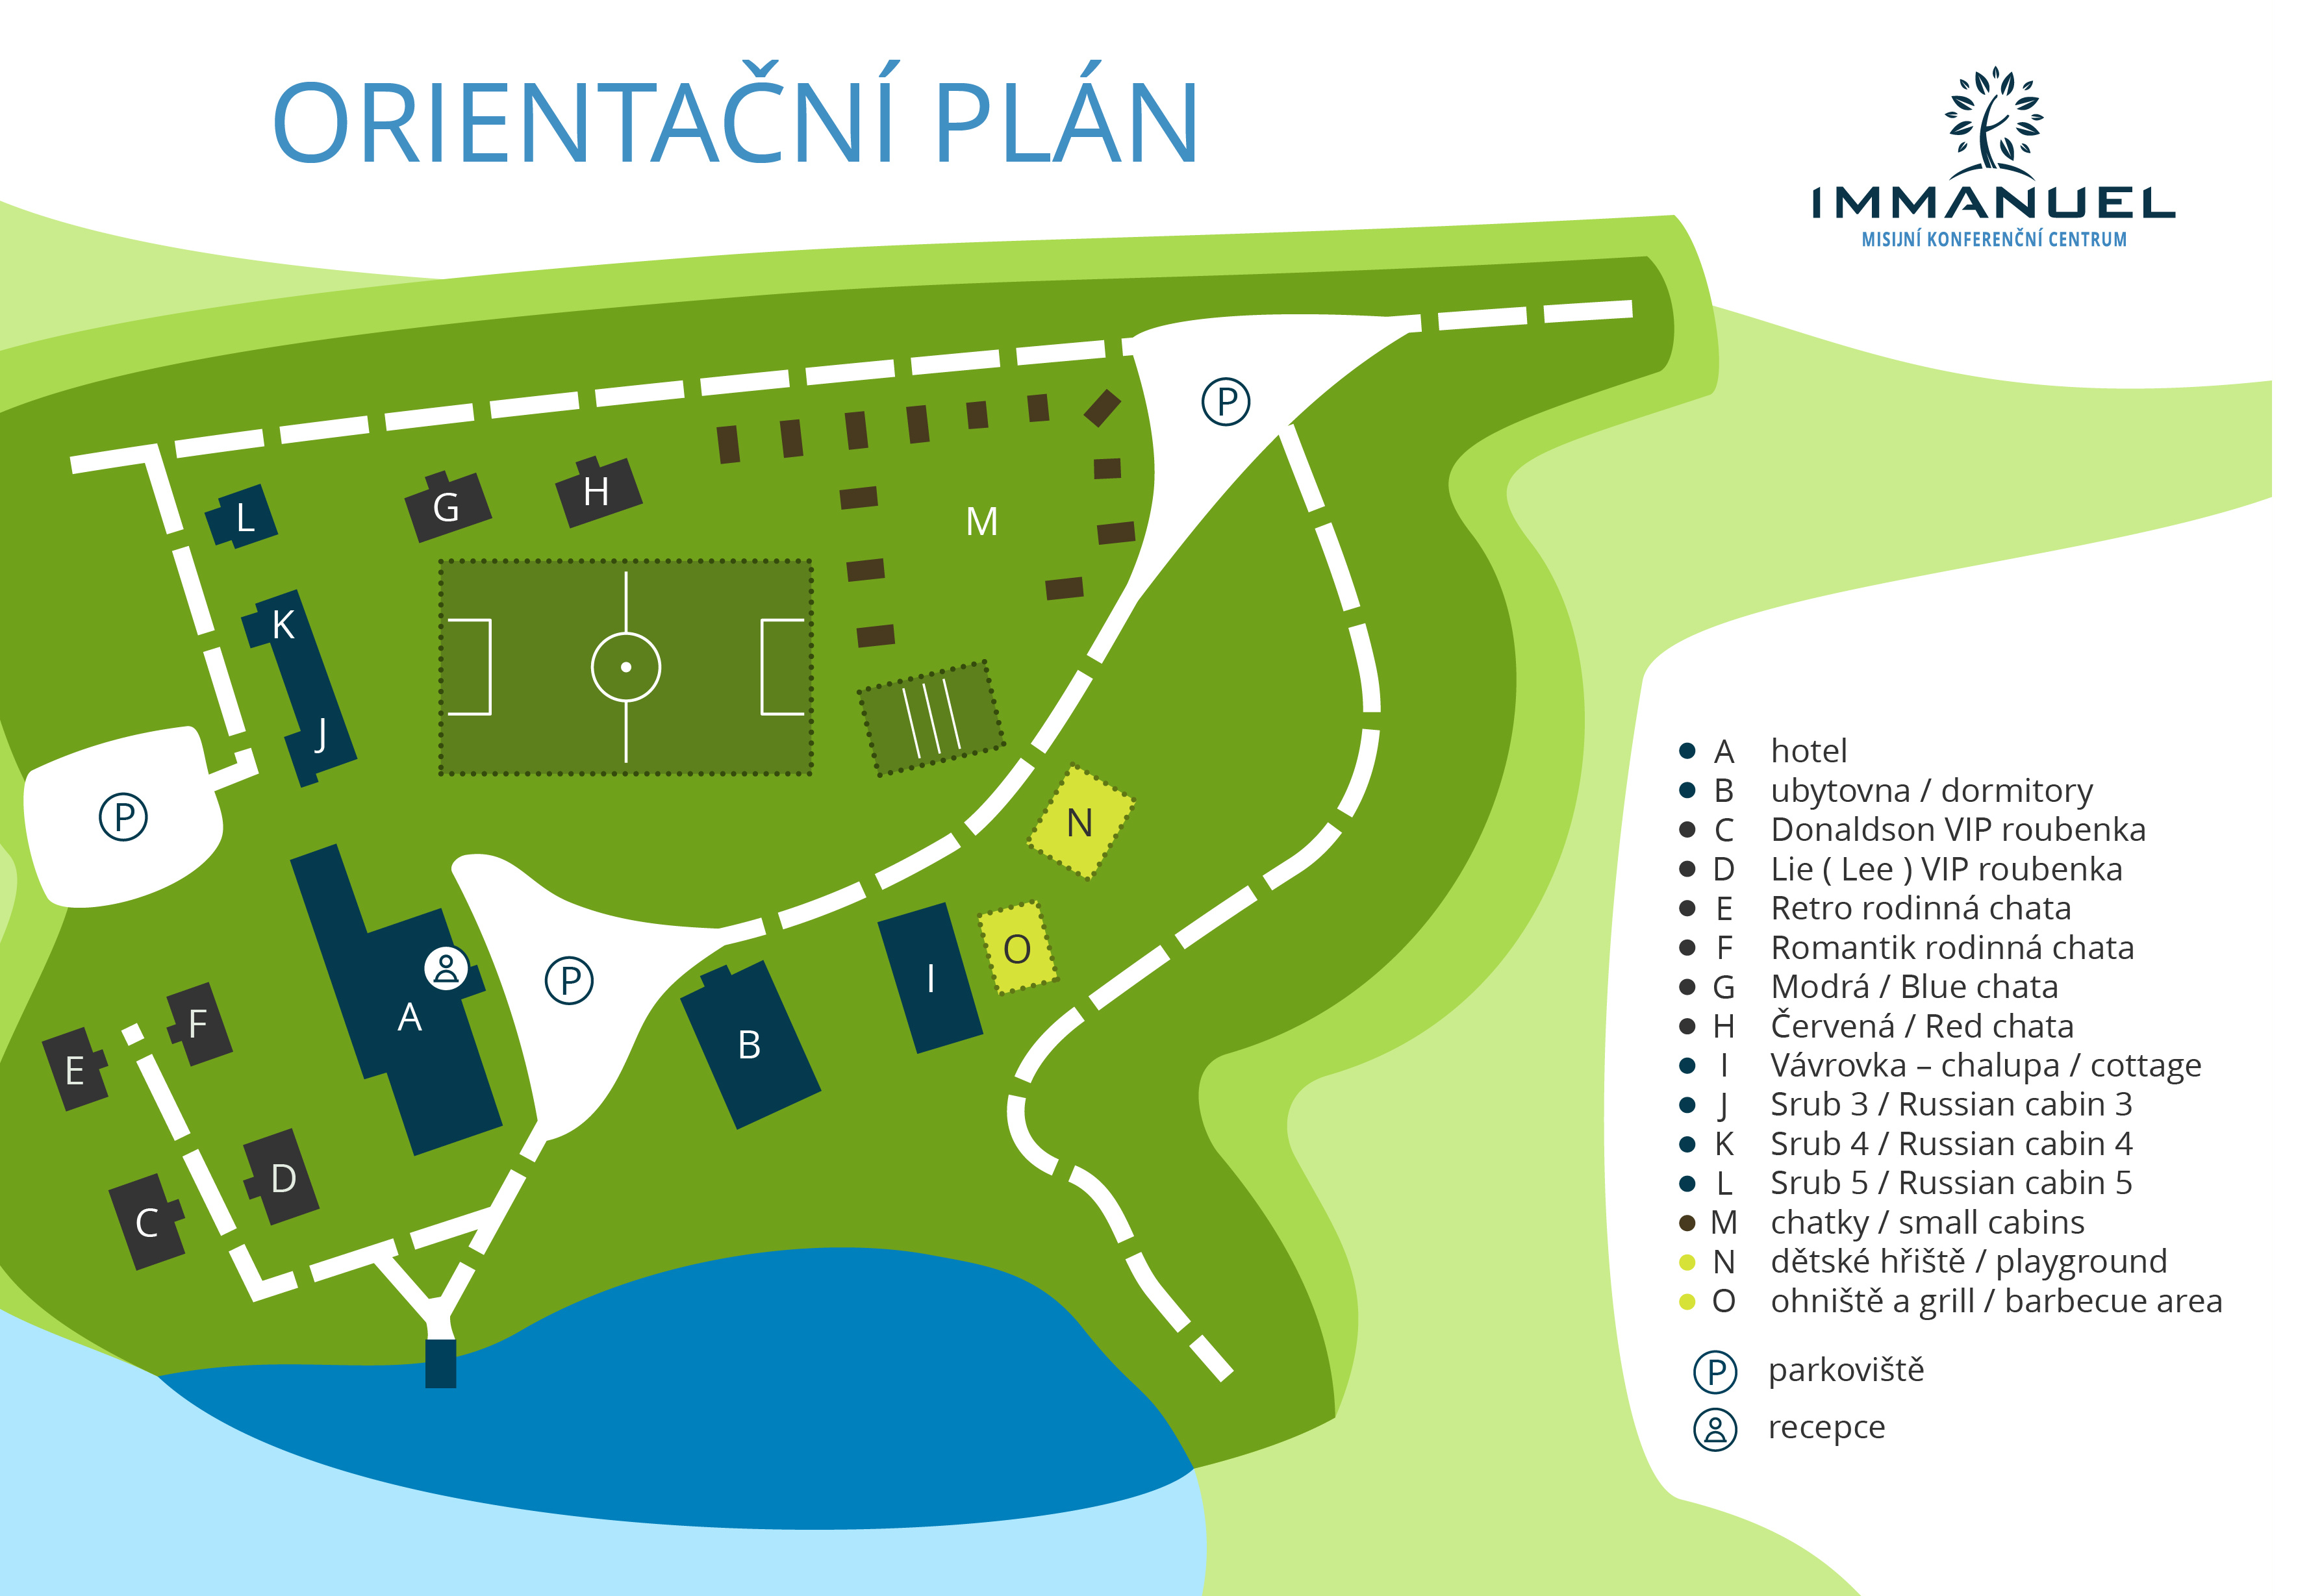 IMANUEL_ORIENTACNI PLAN